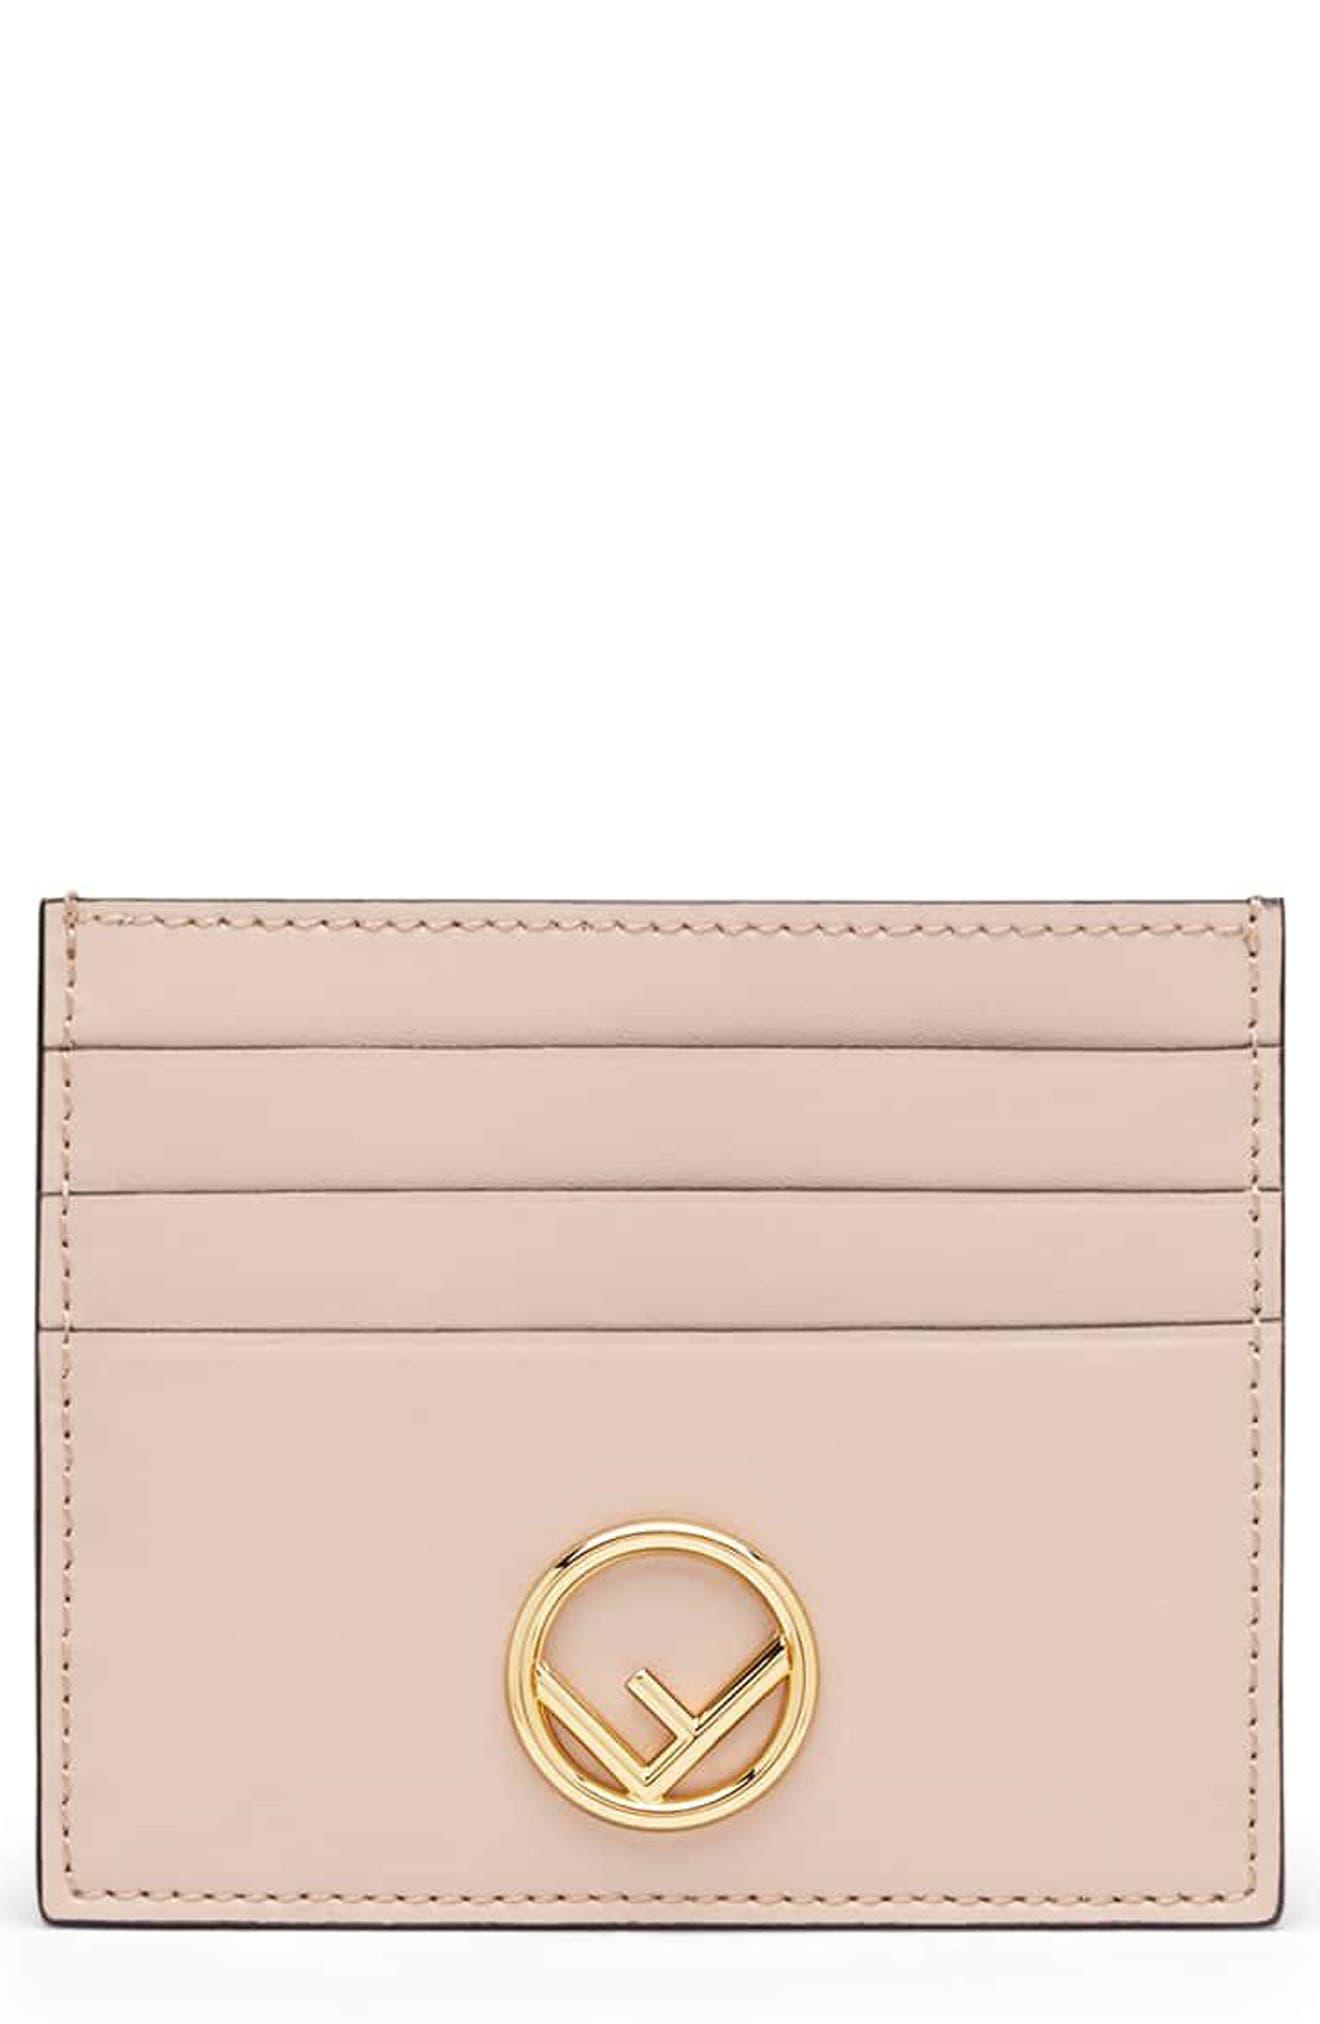 Logo Leather Card Case,                         Main,                         color, SOAP/ ORO SOFT